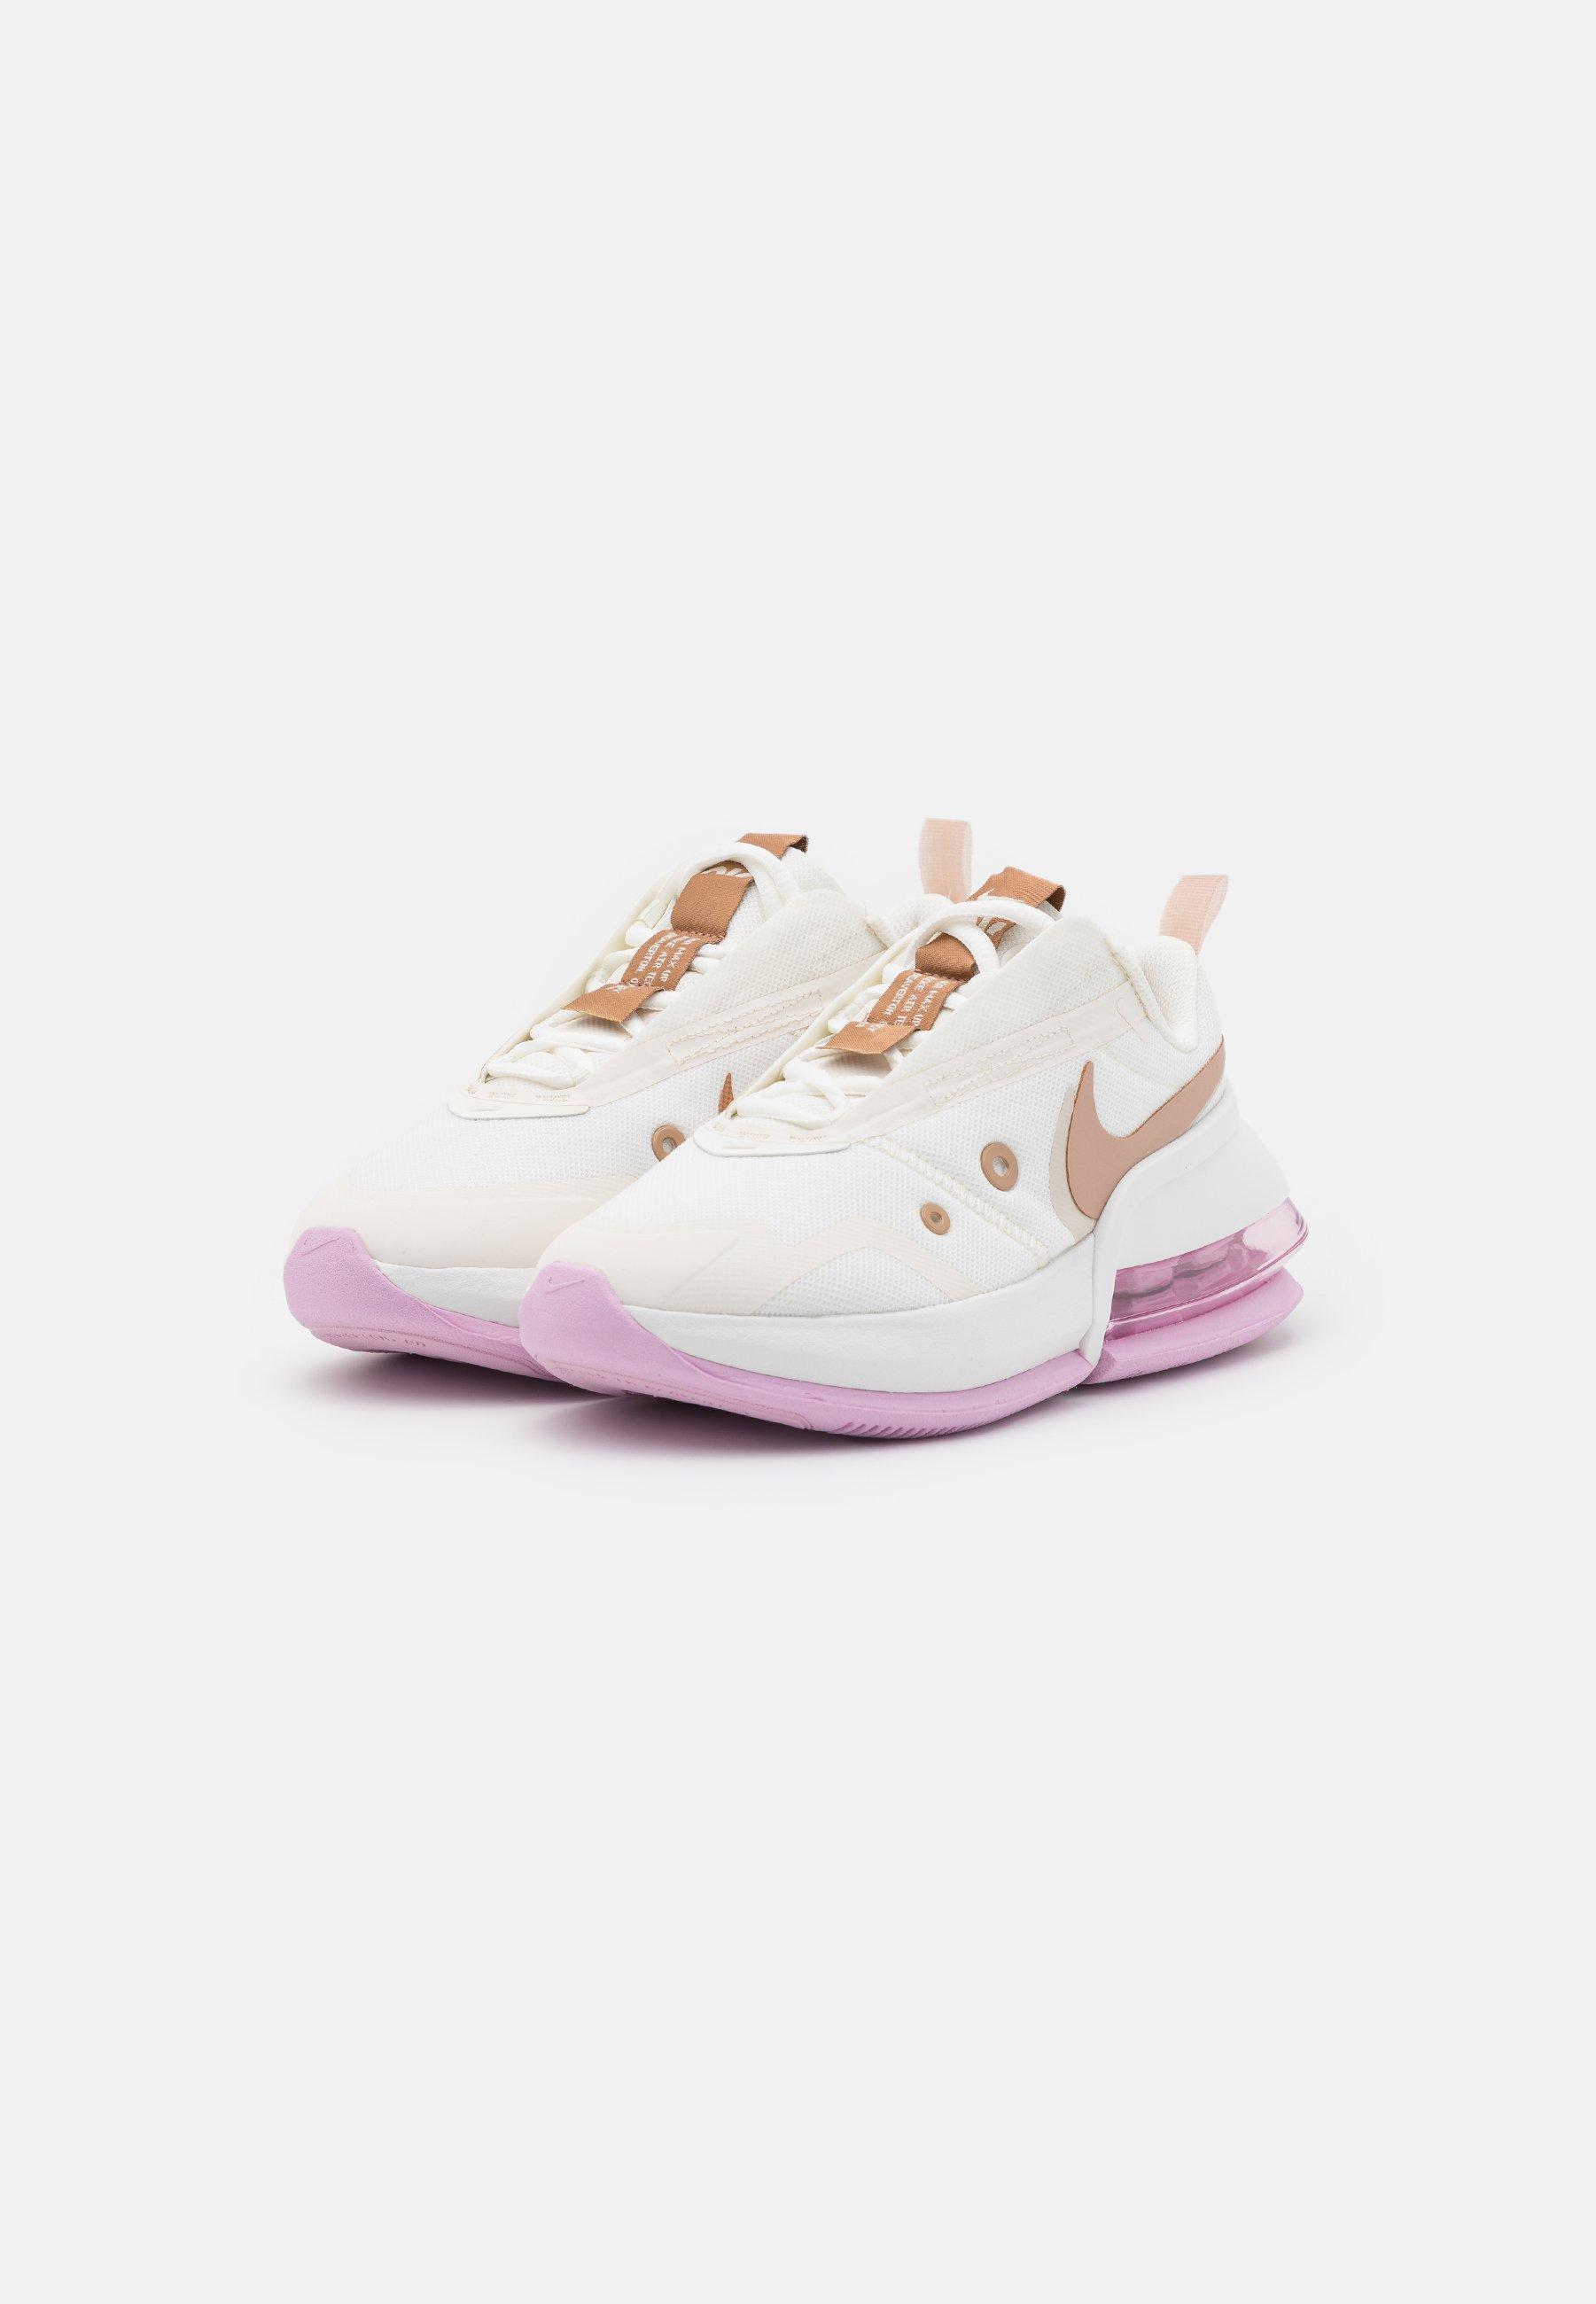 Nike Sportswear AIR MAX UP Sneaker low sail/metallic red bronze/light orewood brown/summit white/light arctic pink/metallic summit white/offwhite